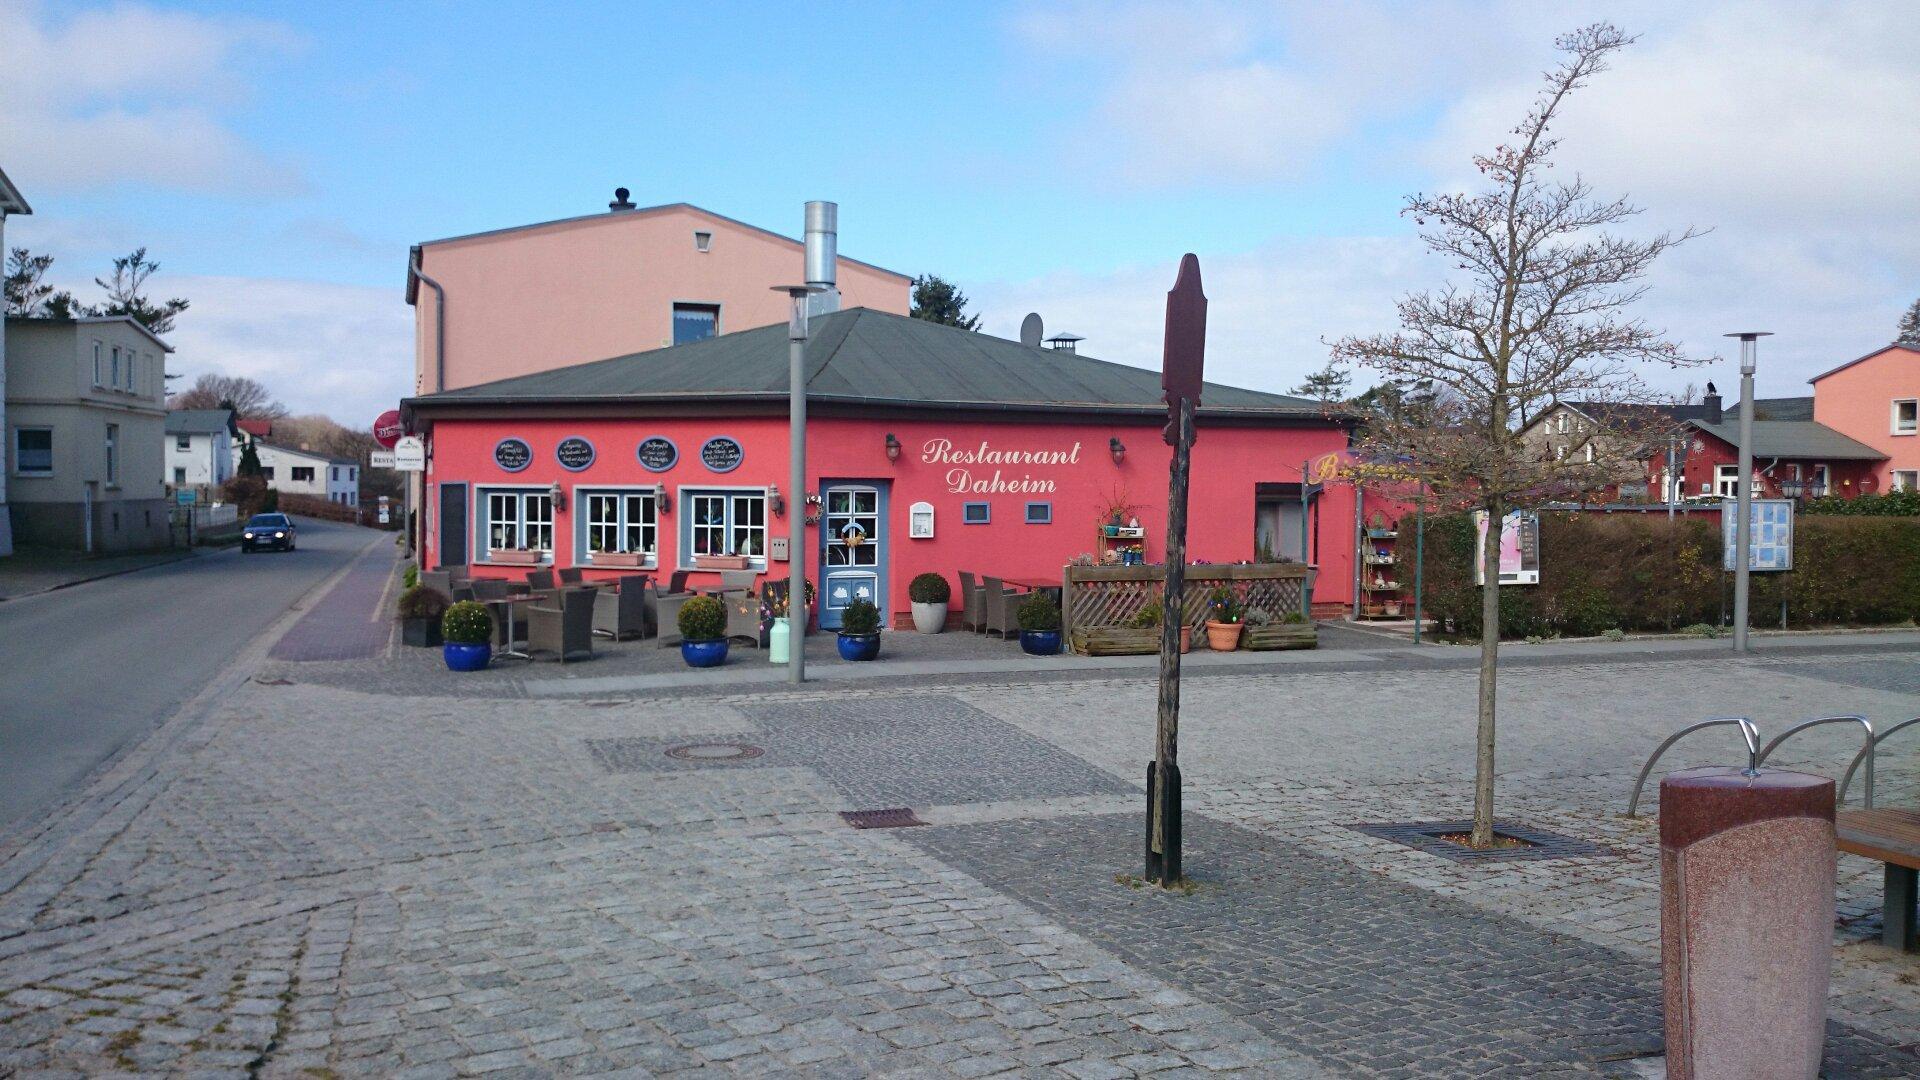 Top 7 Seafood food in Lohme, Mecklenburg-West Pomerania, Germany